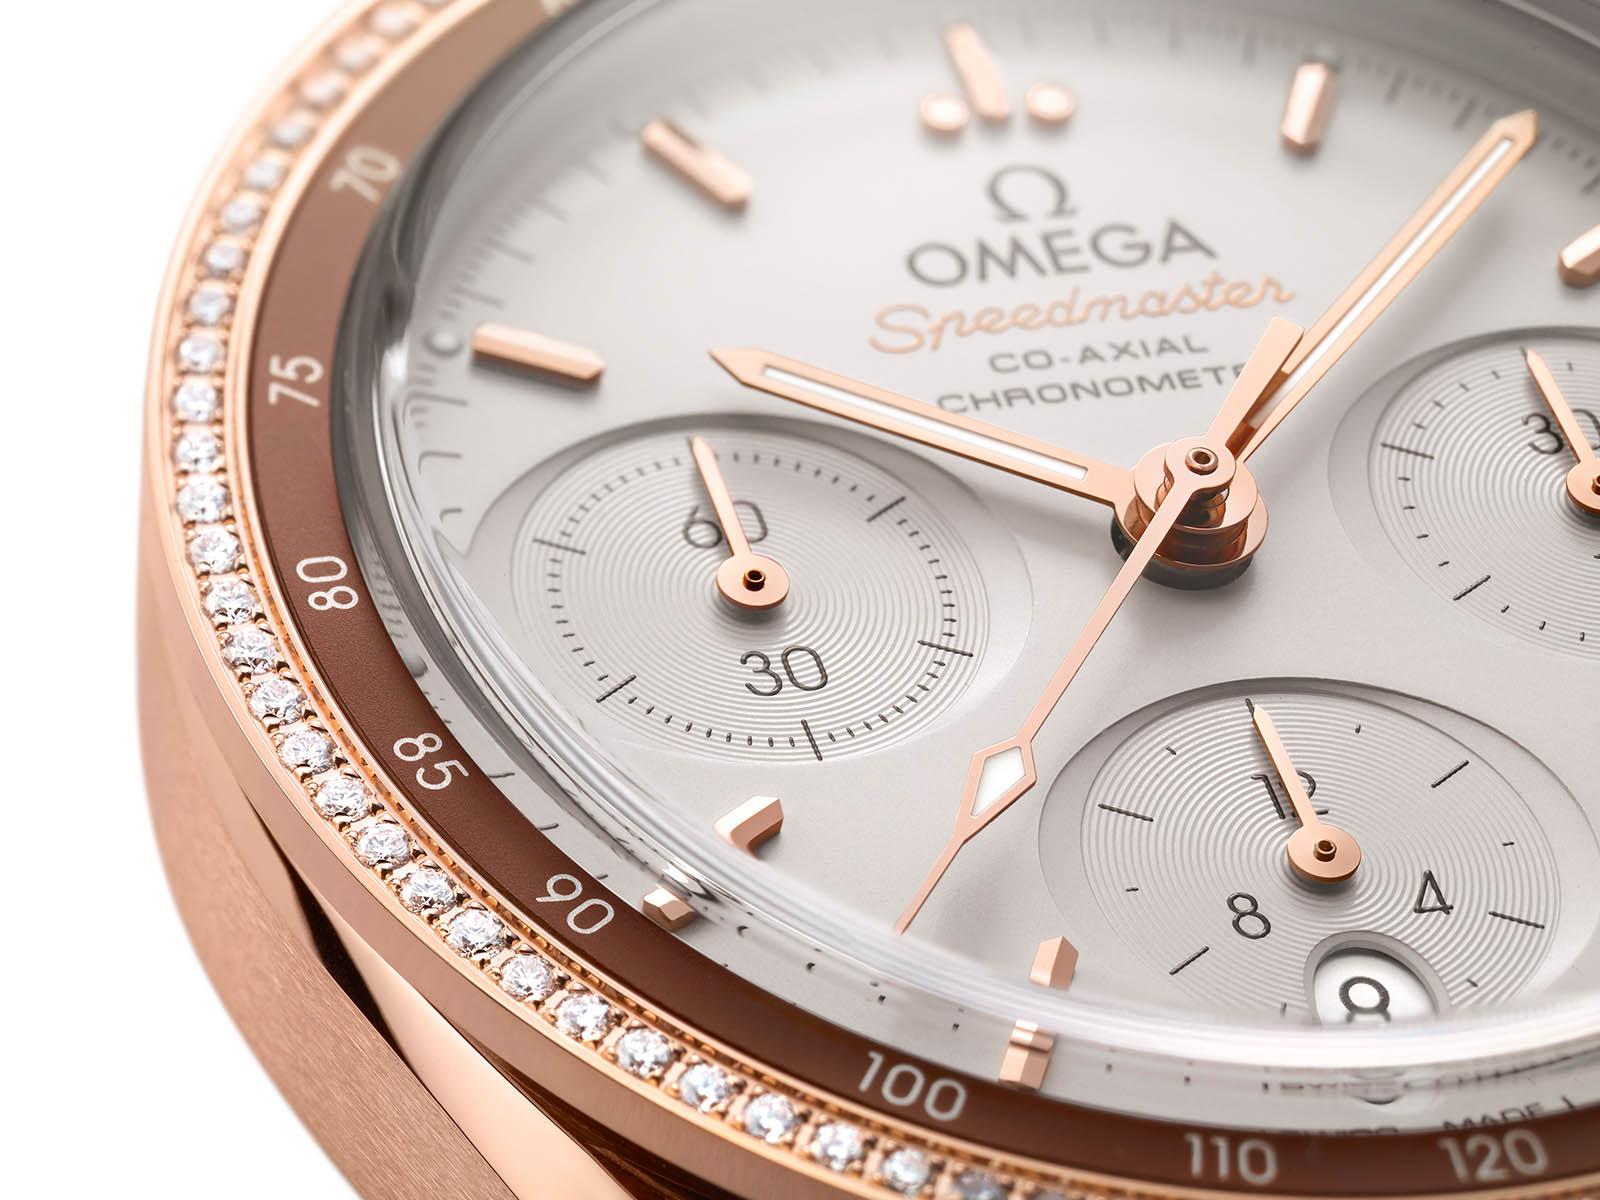 324-68-38-50-02-003-omega-speedmaster-38-co-axial-chronograph-38mm-sedna-gold-diamond-6.jpg